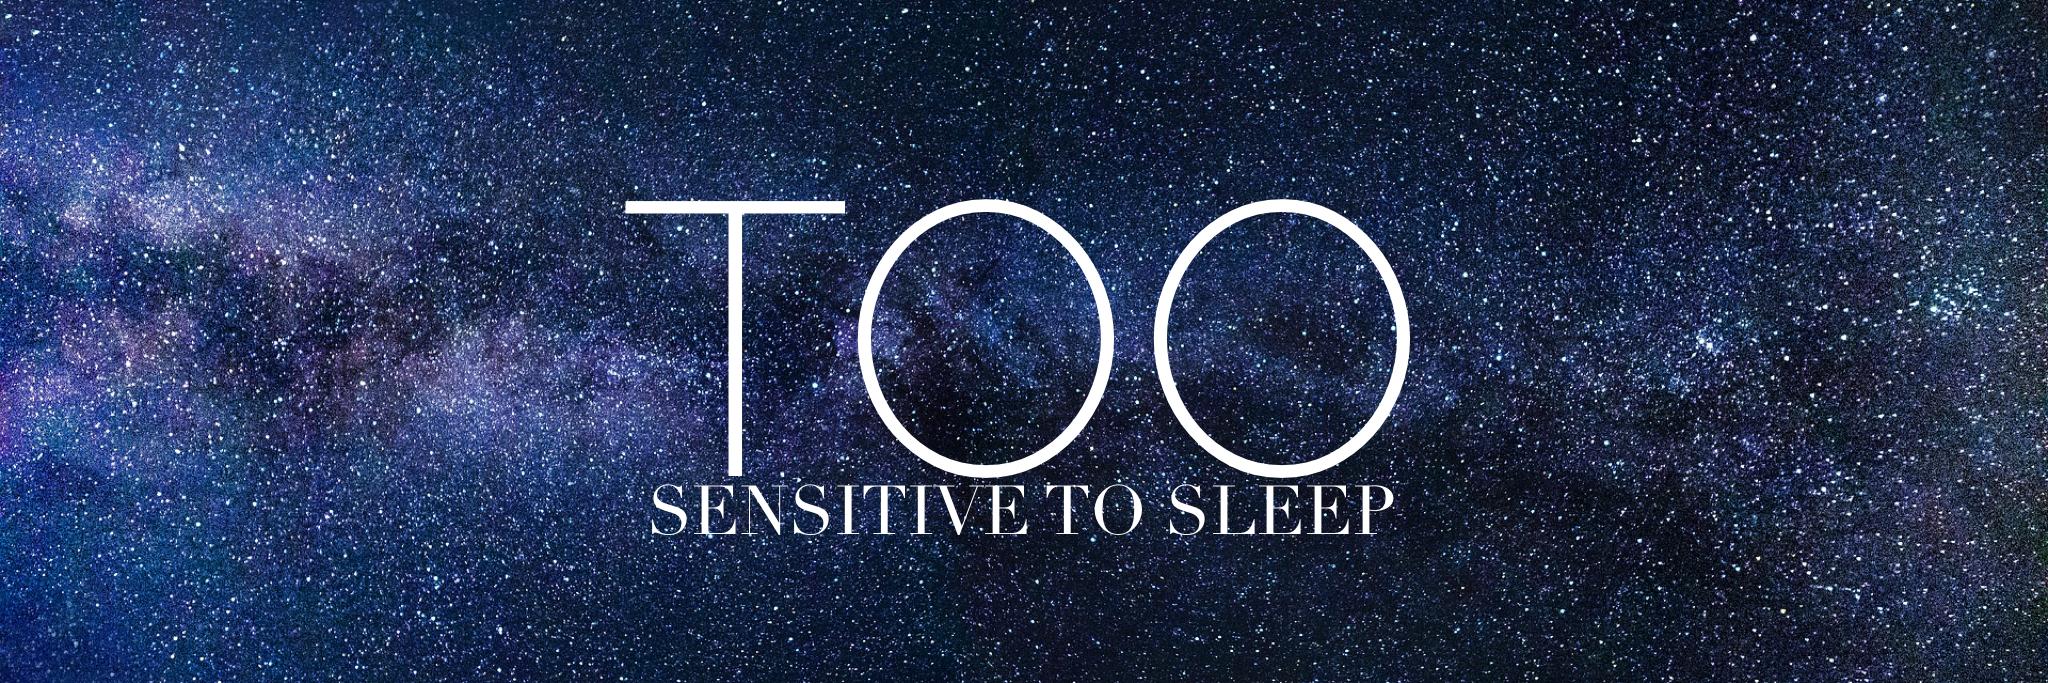 Too-sensitive-to-sleep